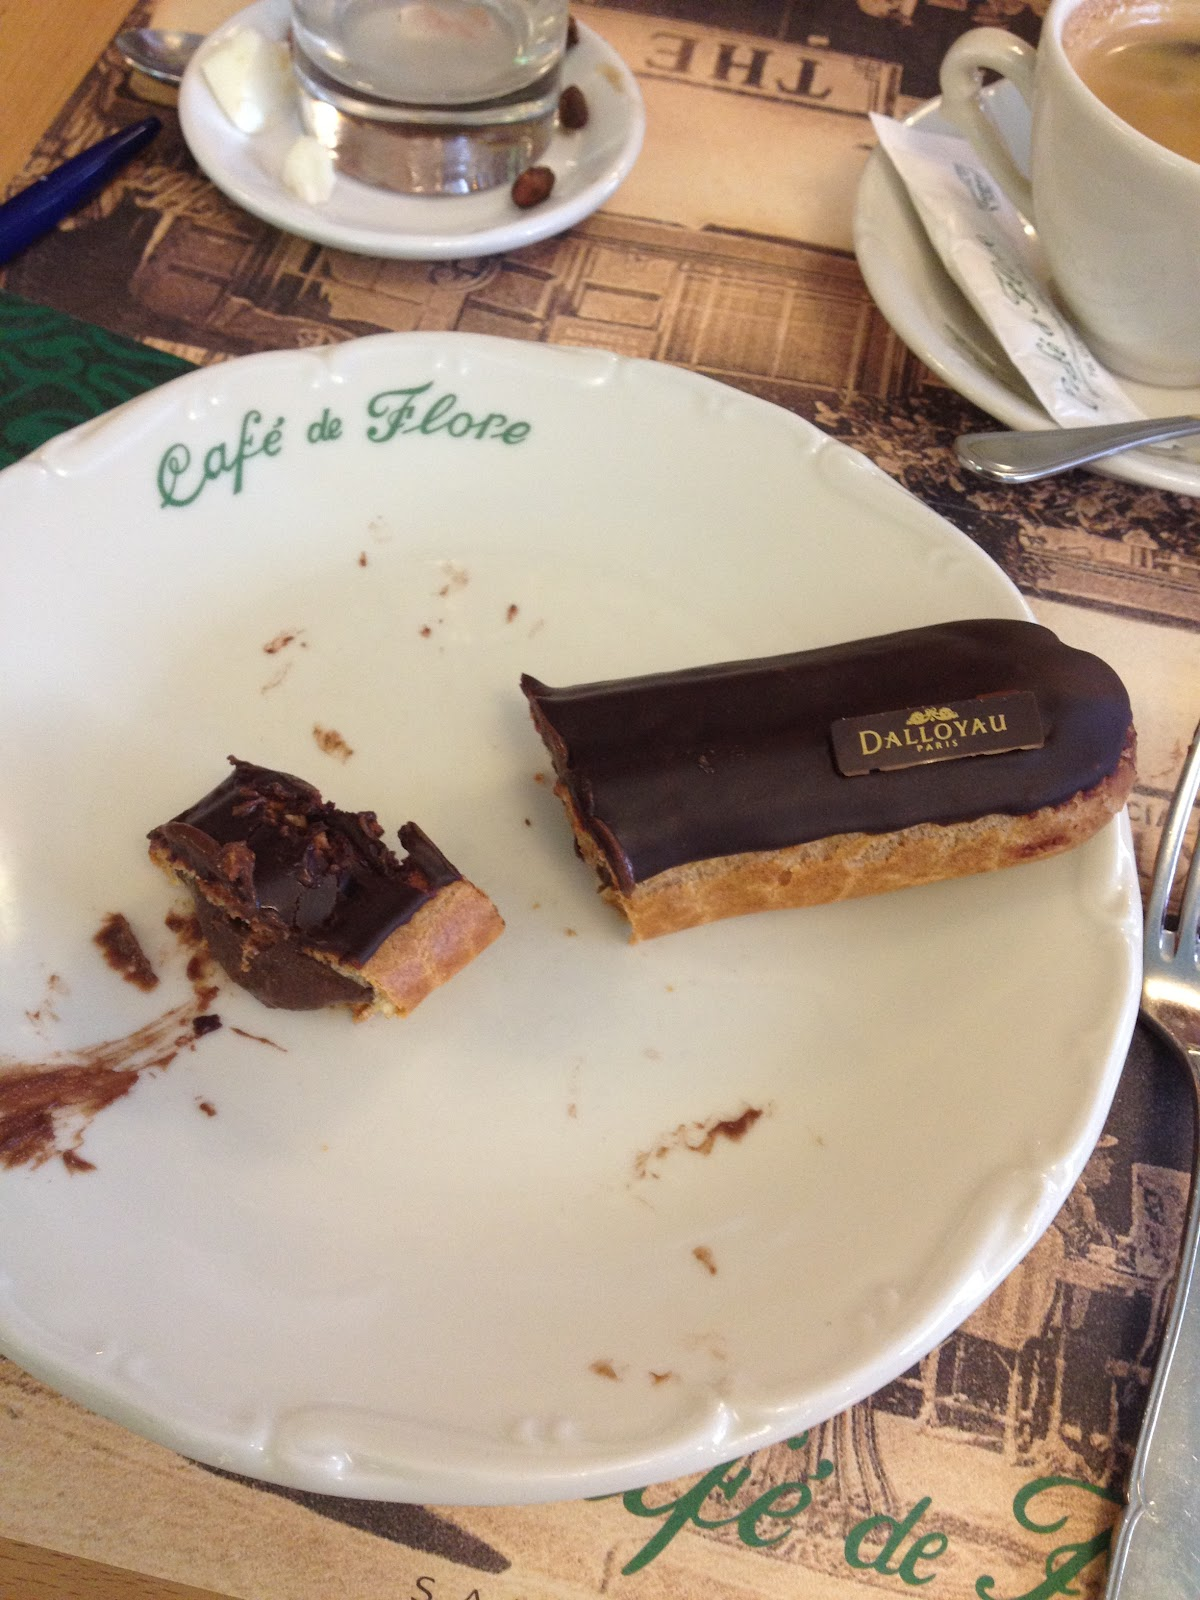 Chocolate Eclair Cafe de Flores Paris BiniBlog